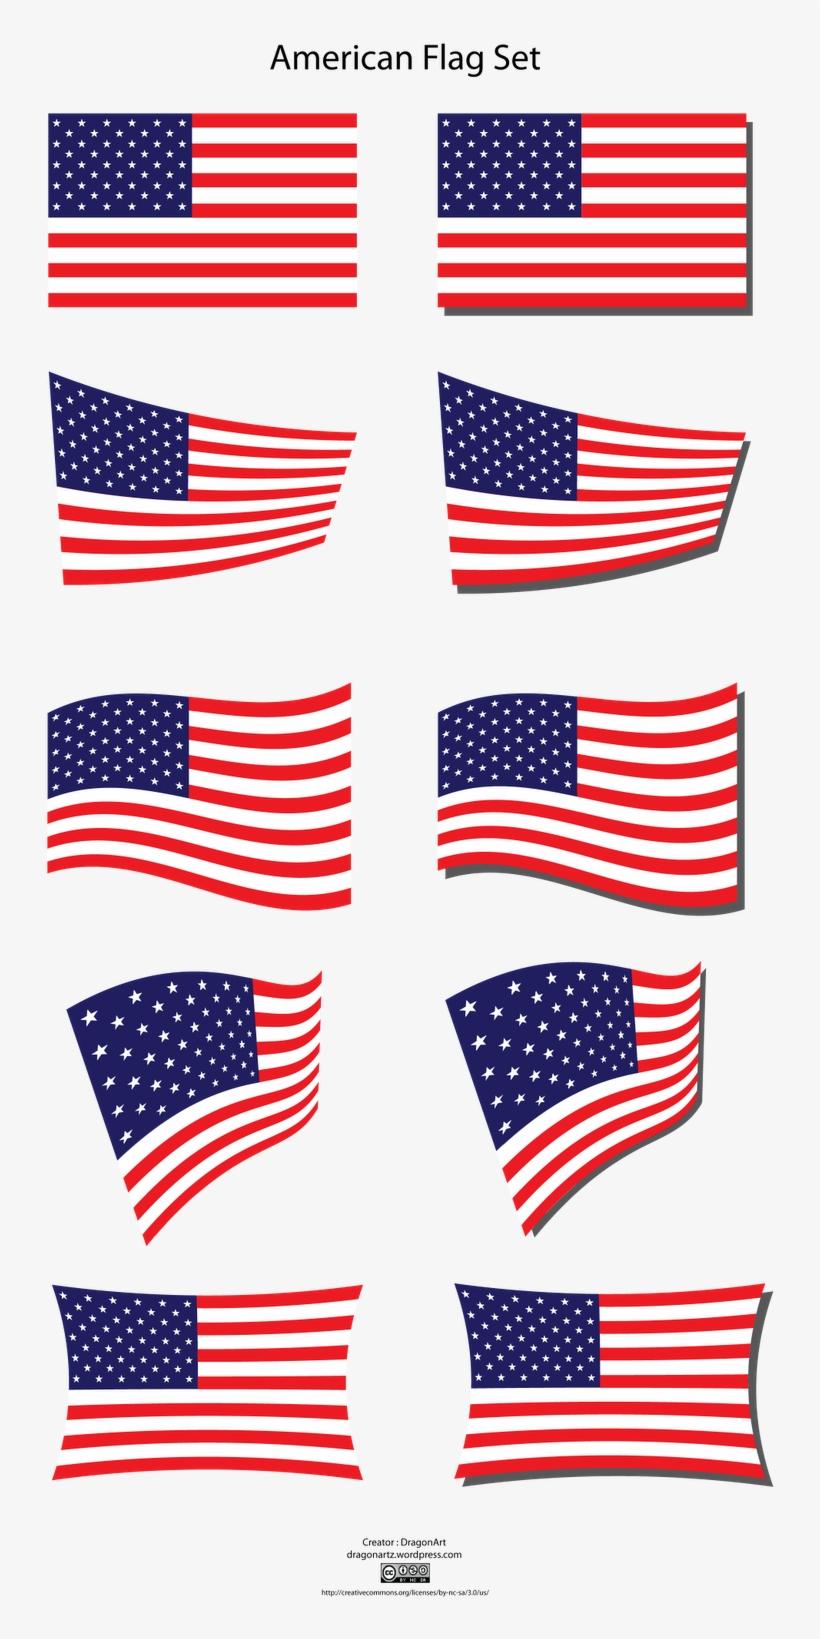 Free Hd Flags Transparent Image - BerkshireRegion